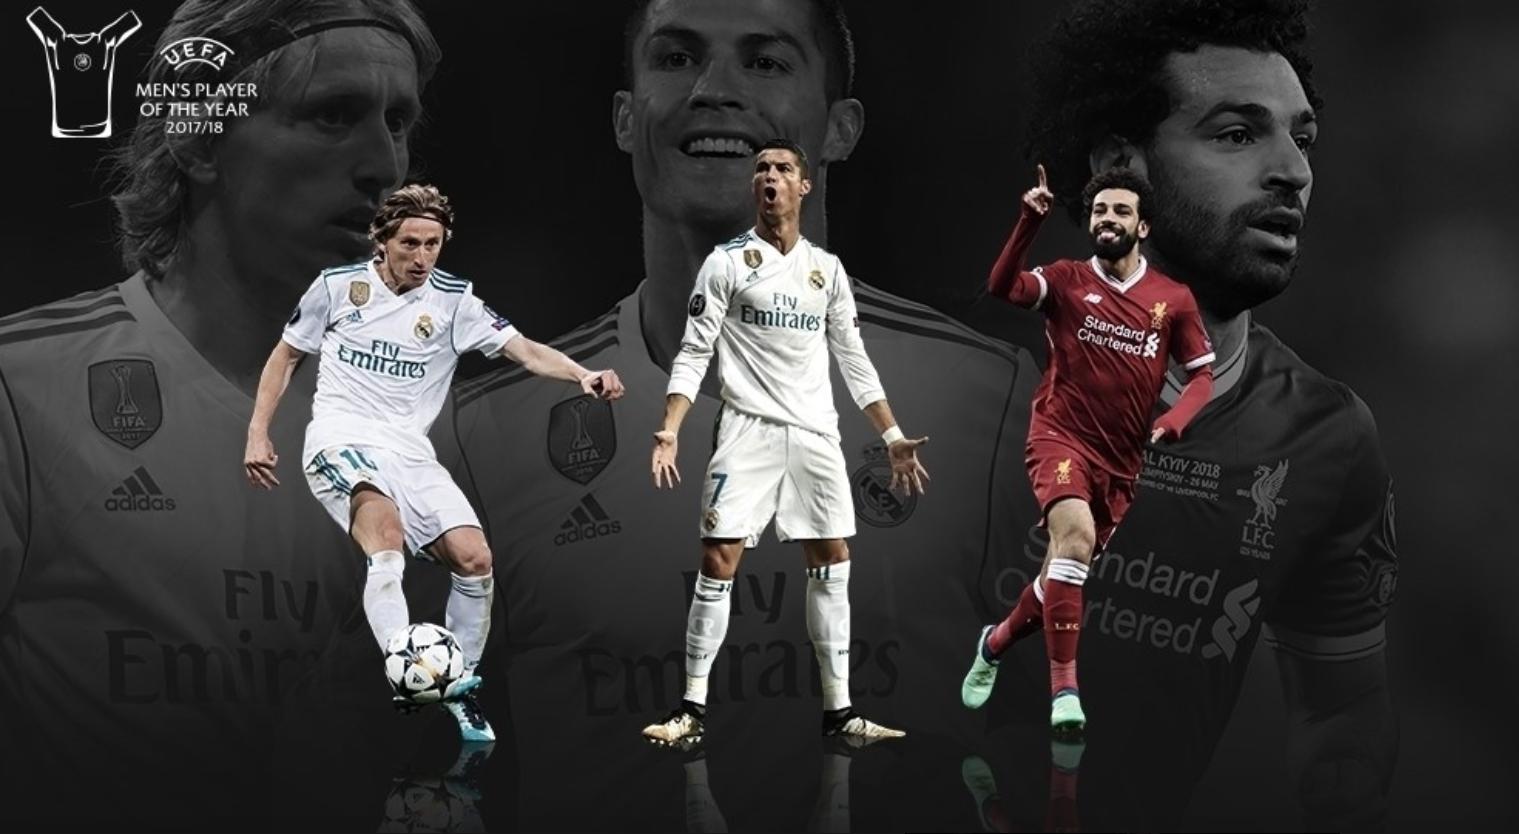 <p><strong></strong><span>Фото: &copy;&nbsp;UEFA.com</span></p>